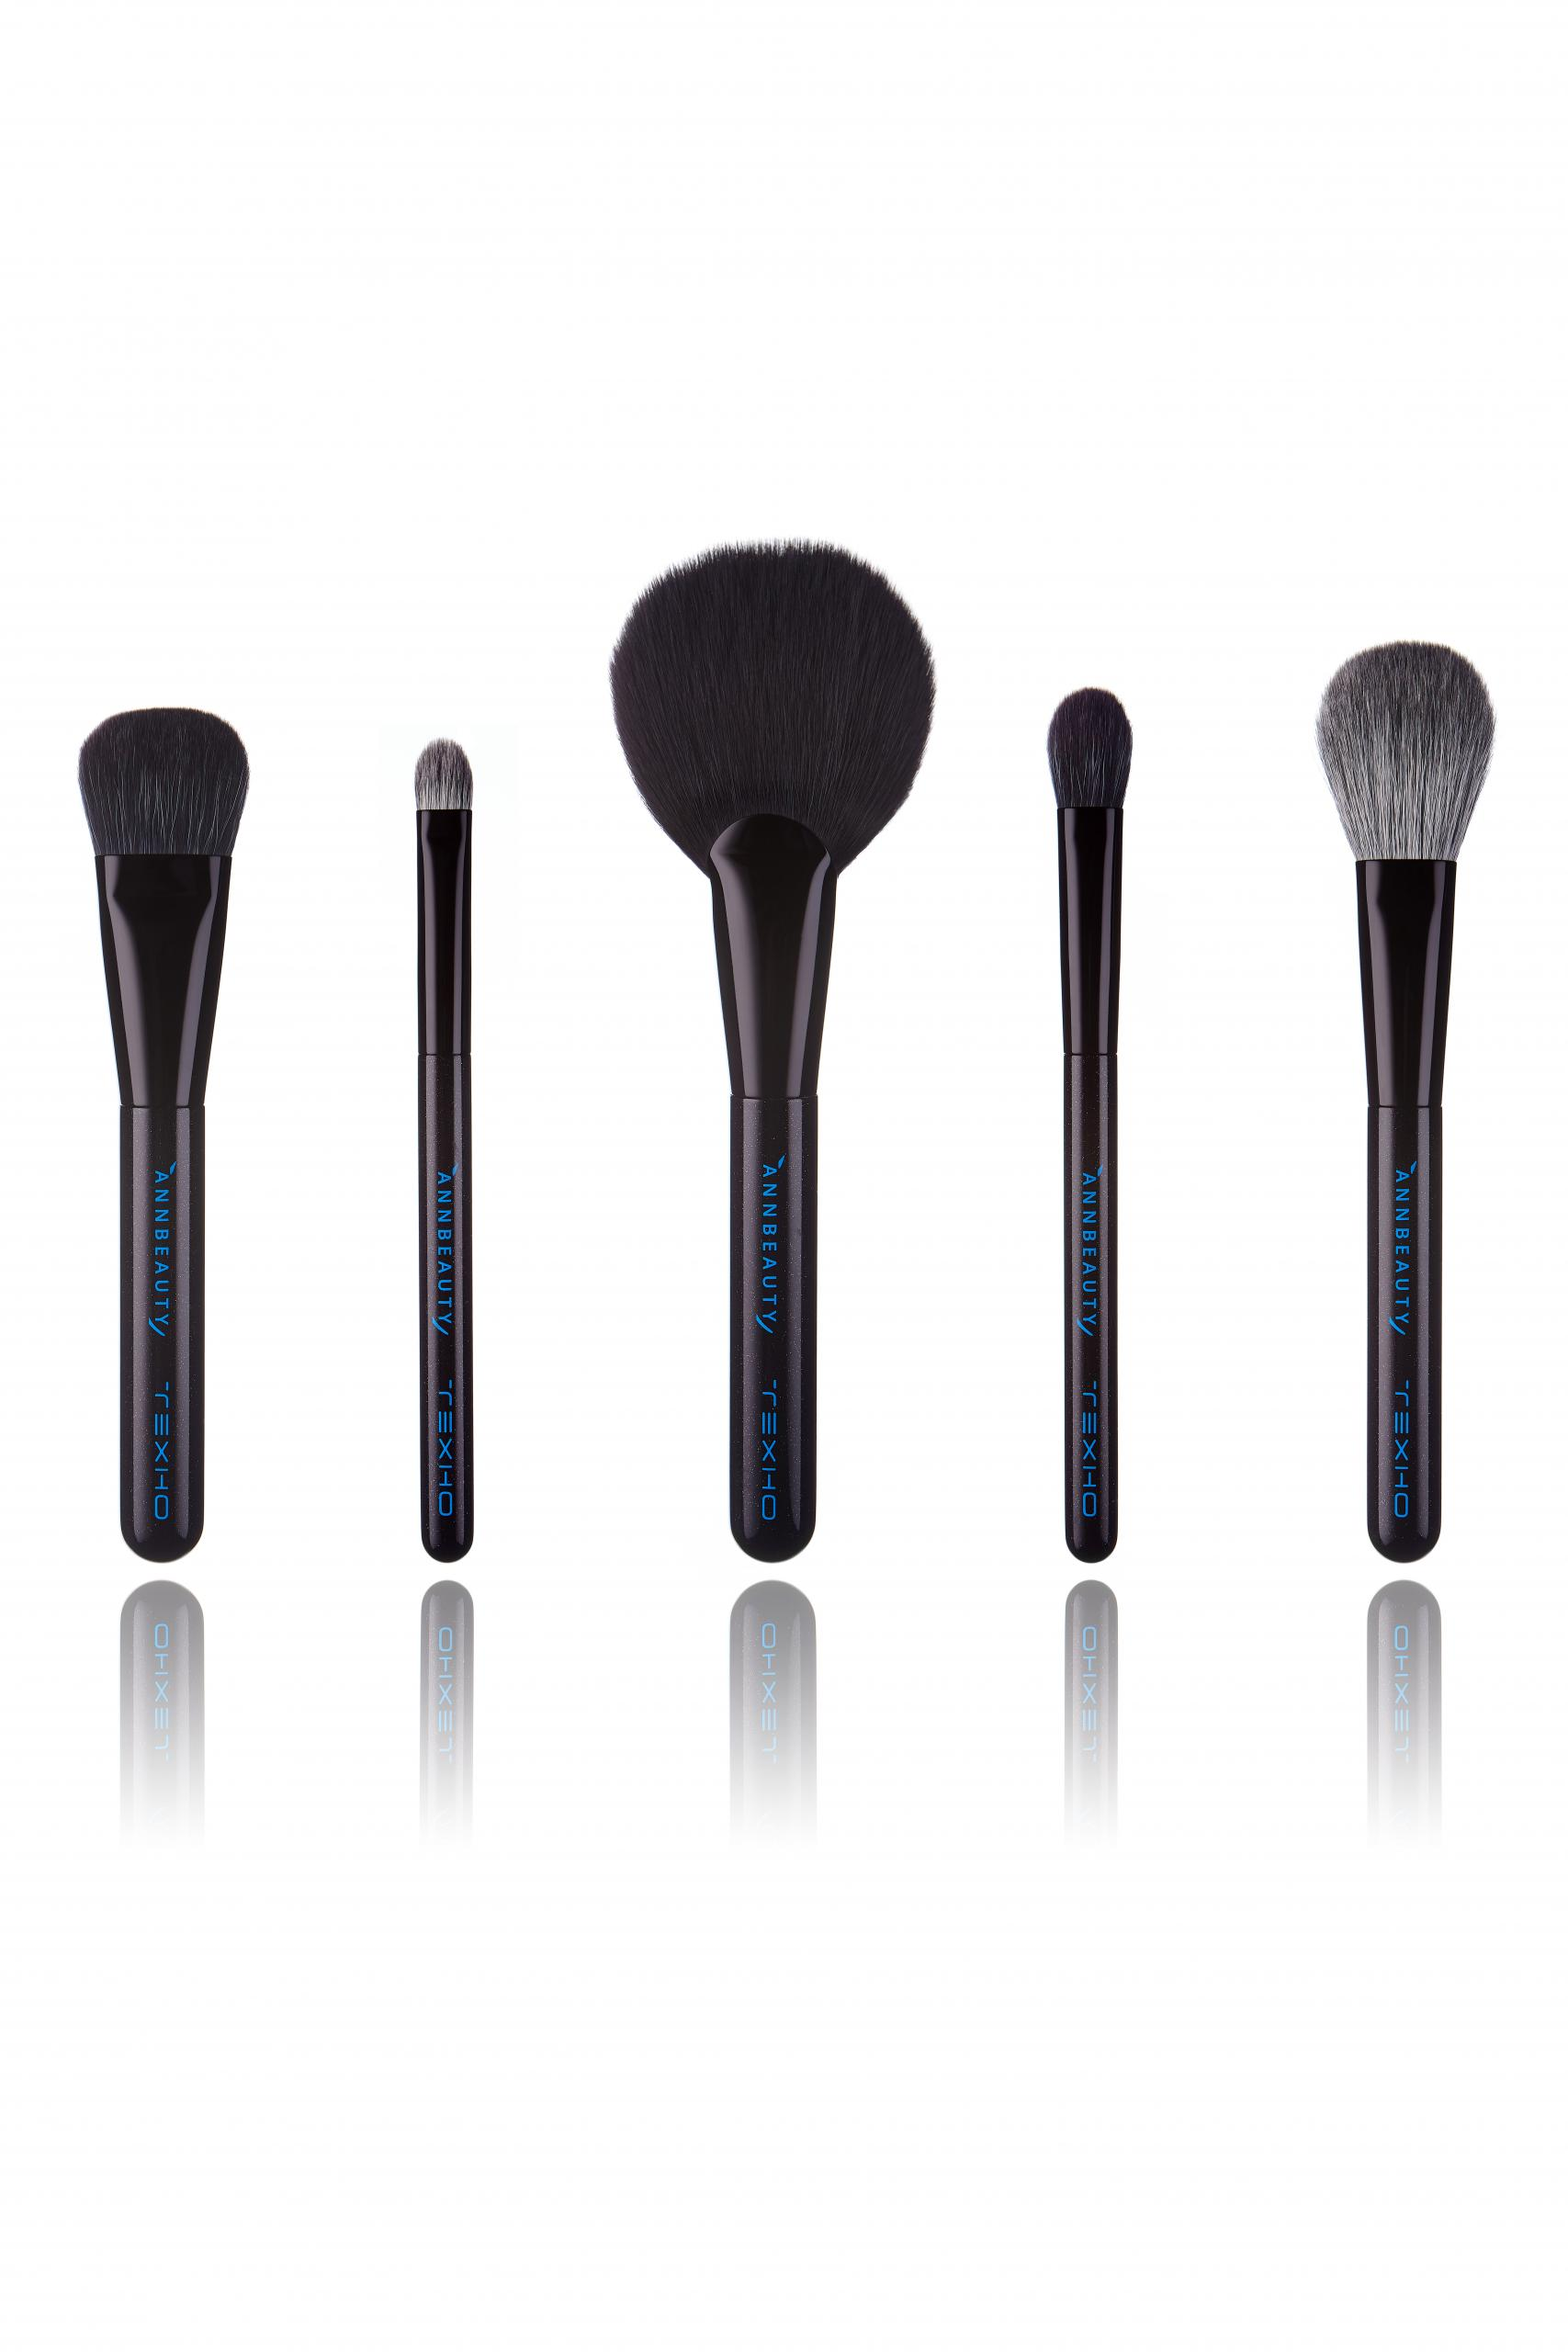 Набор кистей для макияжа Annbeauty ТЕХНО - лимитированная коллекция 2021 года